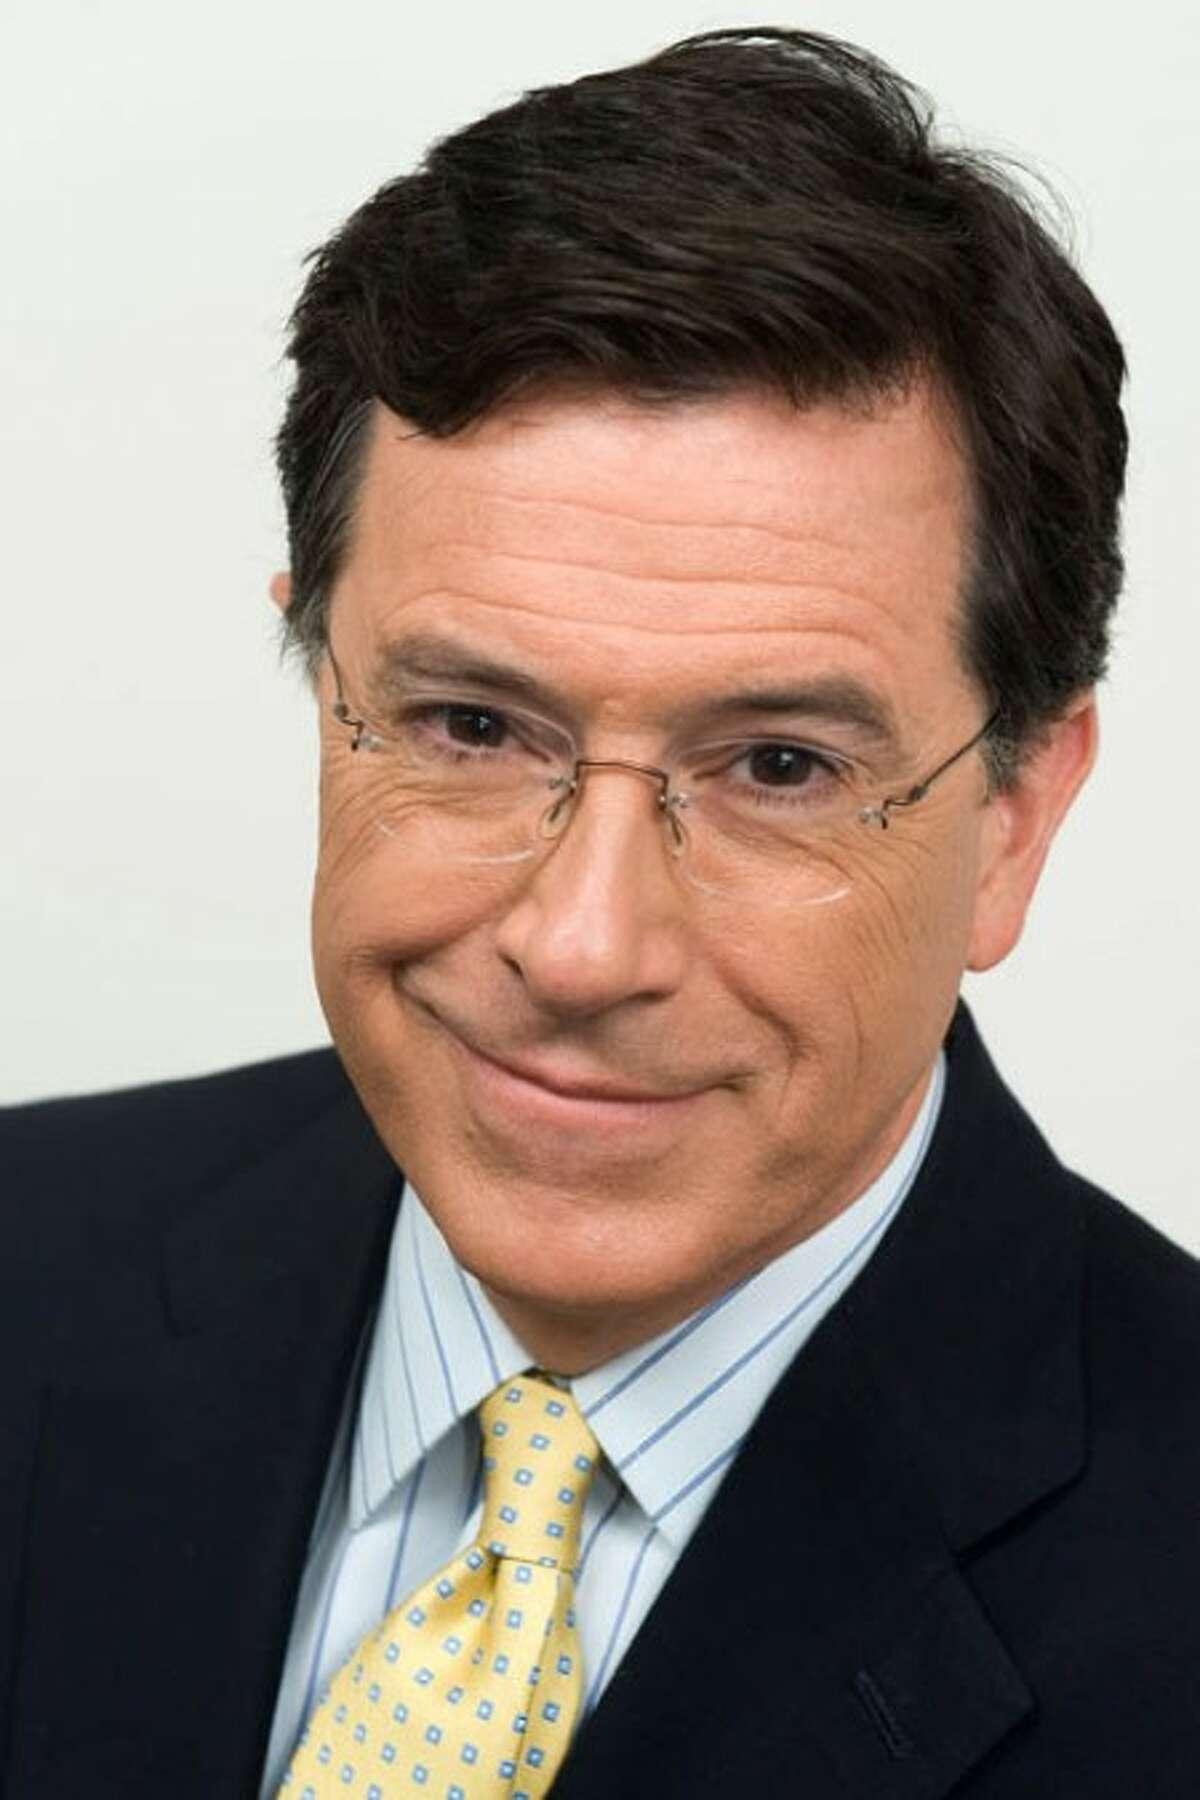 Stephen Colbert is shown in New York. (AP Photo/Charles Sykes, file)